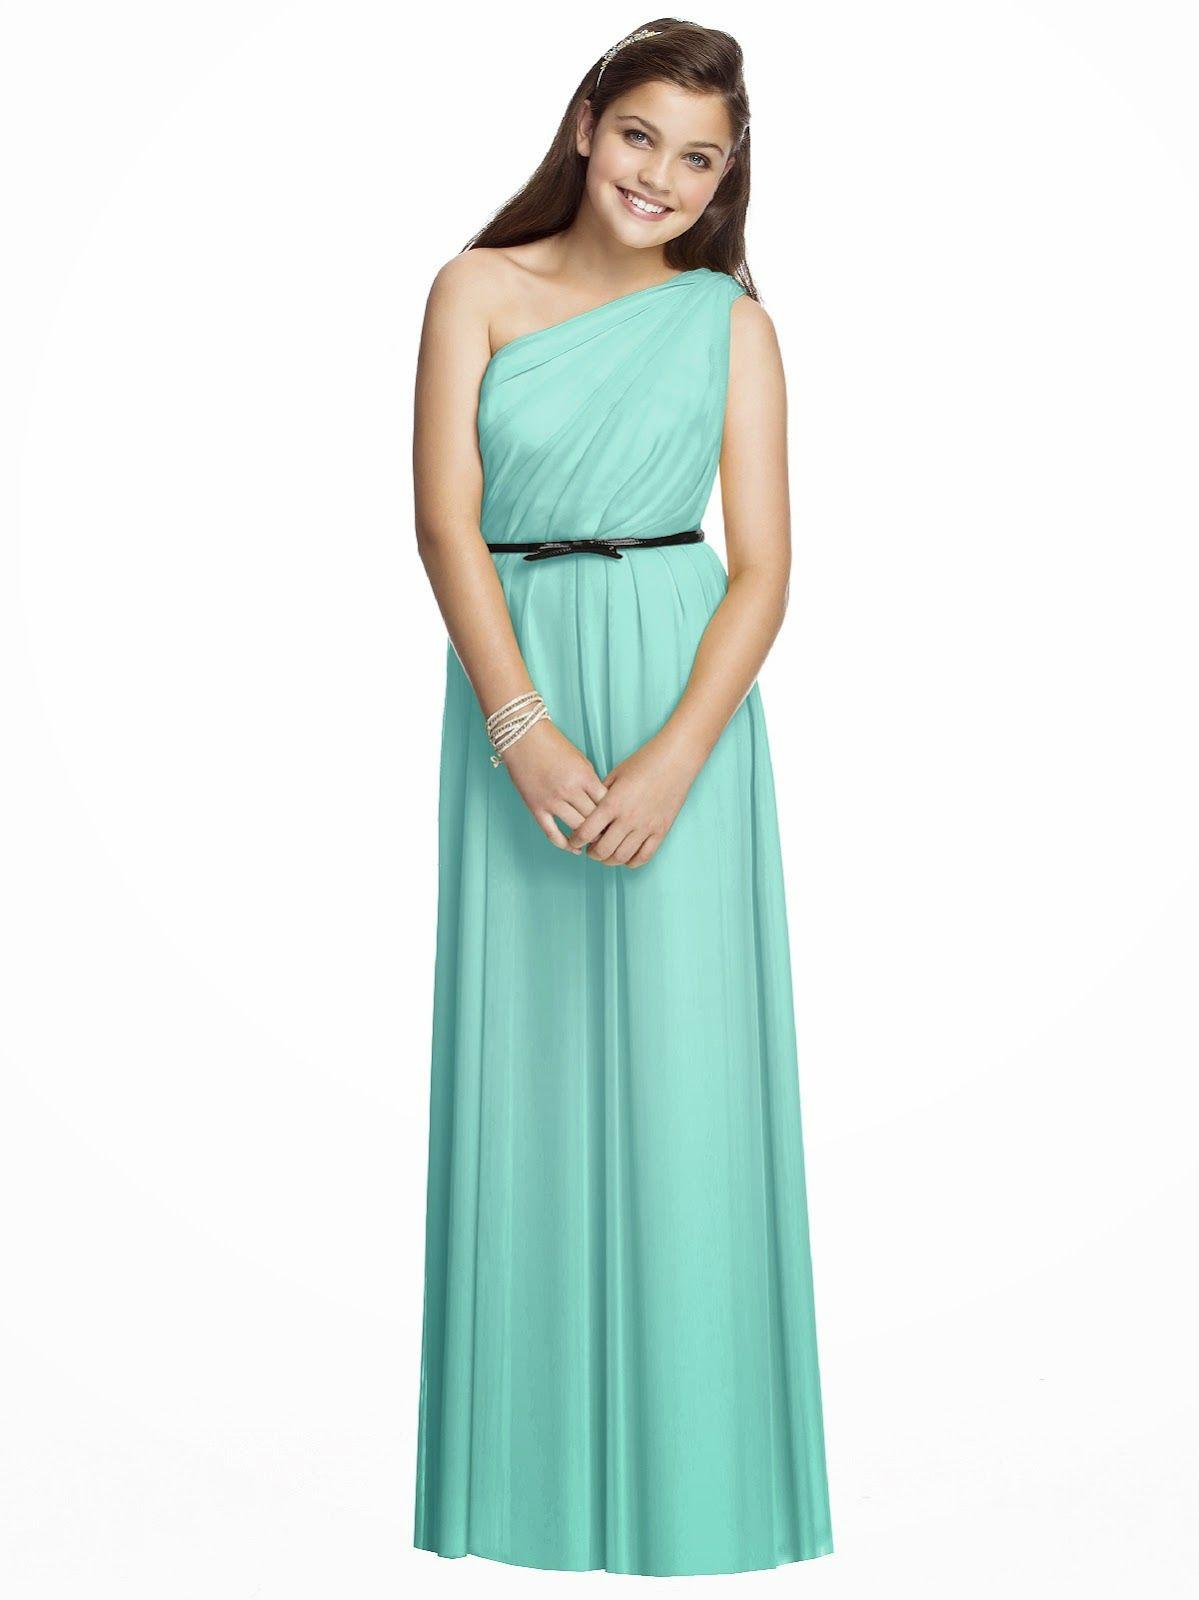 Macy's party dresses weddings  Macy Dresses for Weddings  Wedding Dresses for the Mature Bride